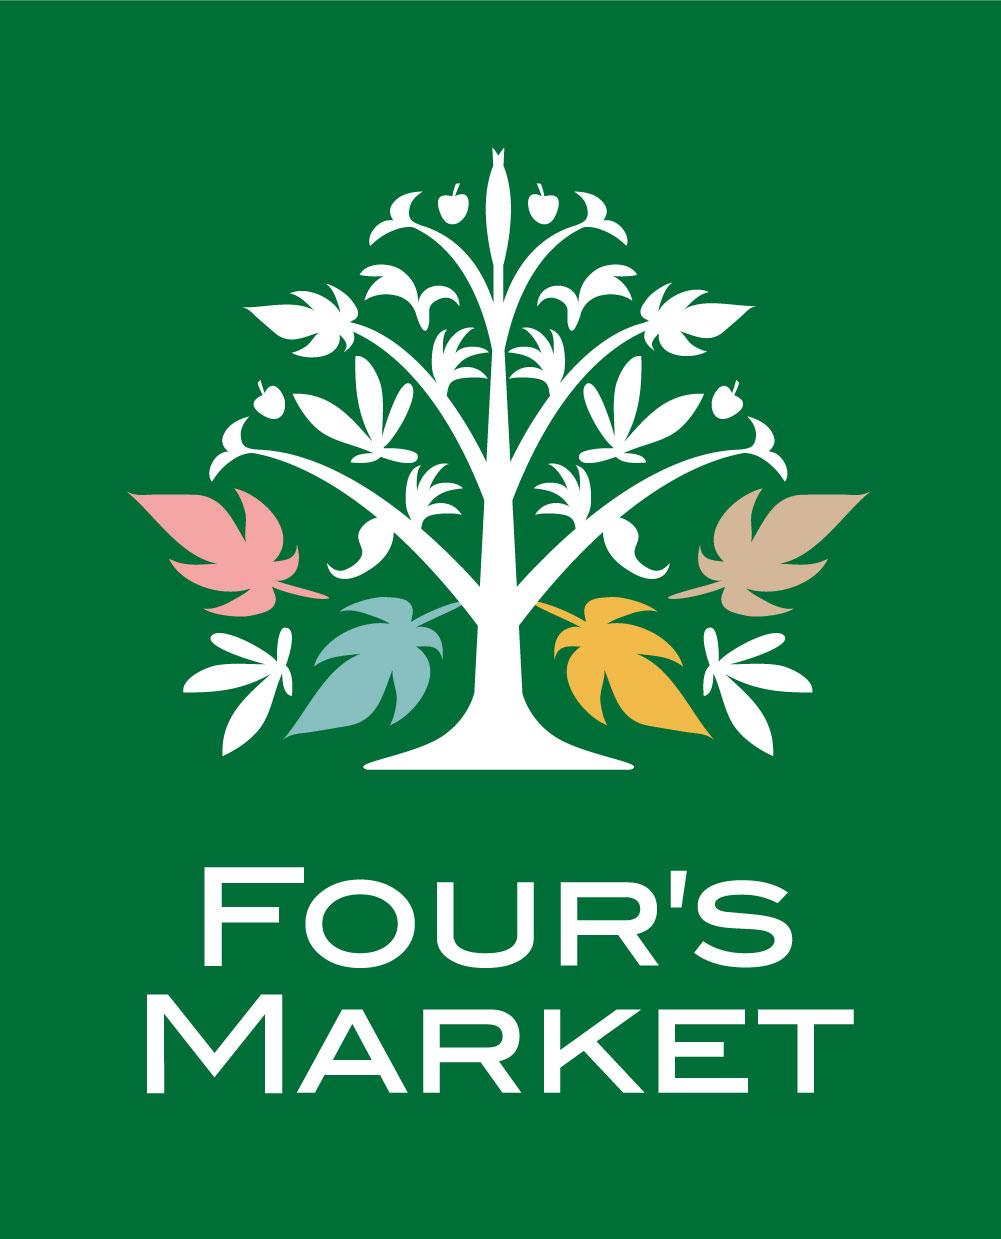 foursmarket-green